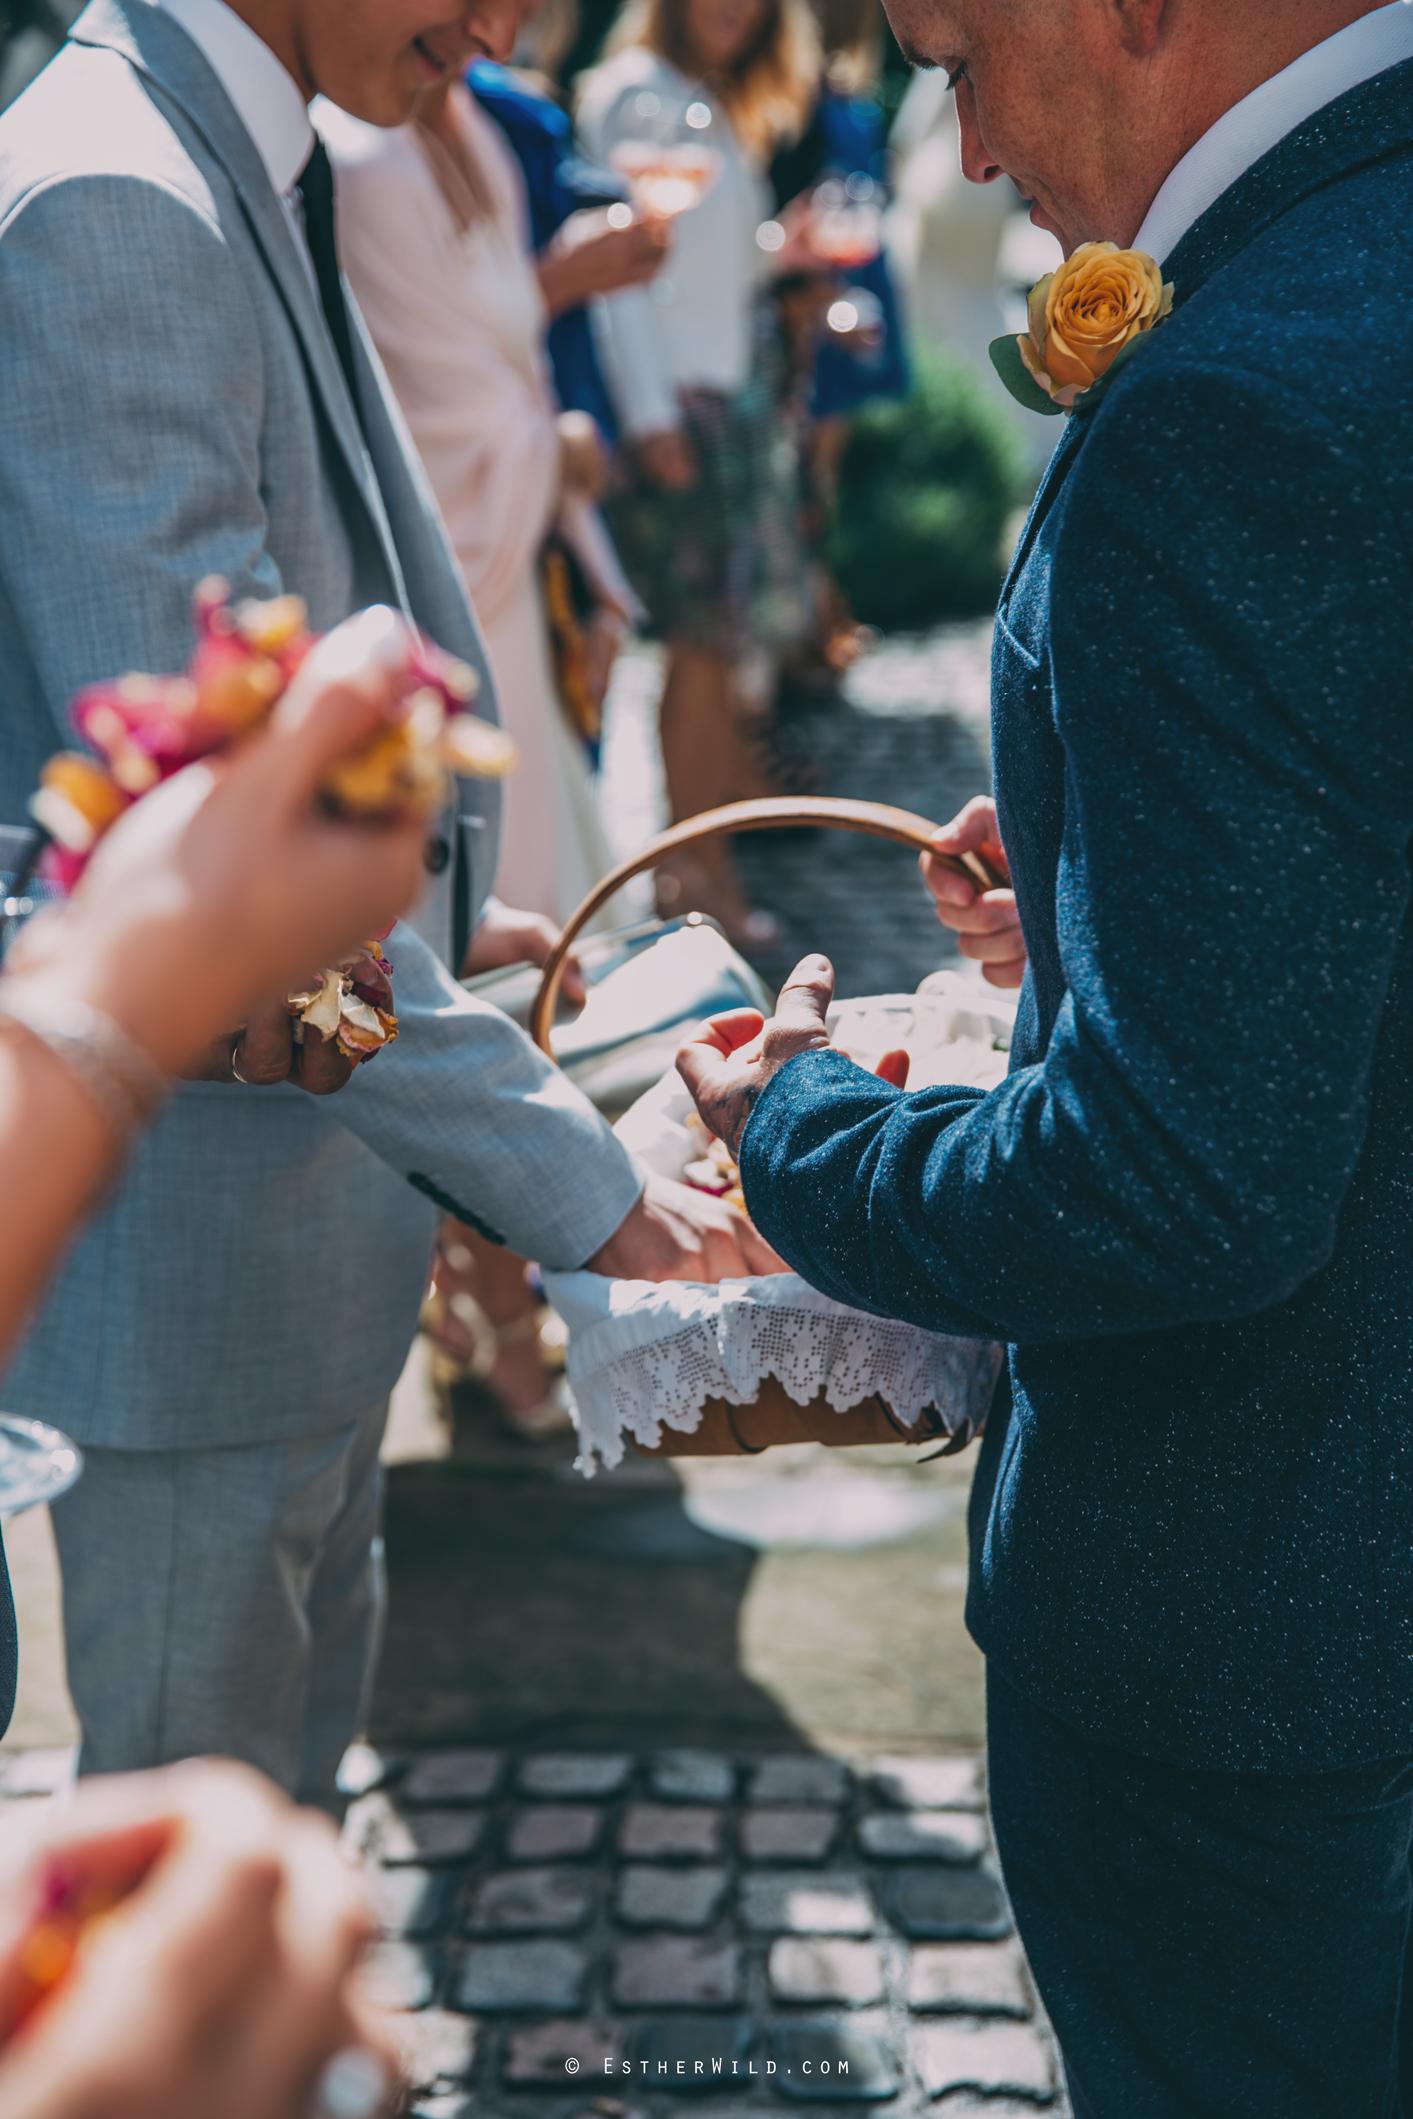 0817_Rathskellar_Kings_Lynn_East_Lexham_Church_Wedding_Photographer_Esther_Wild_IMG_1353.jpg